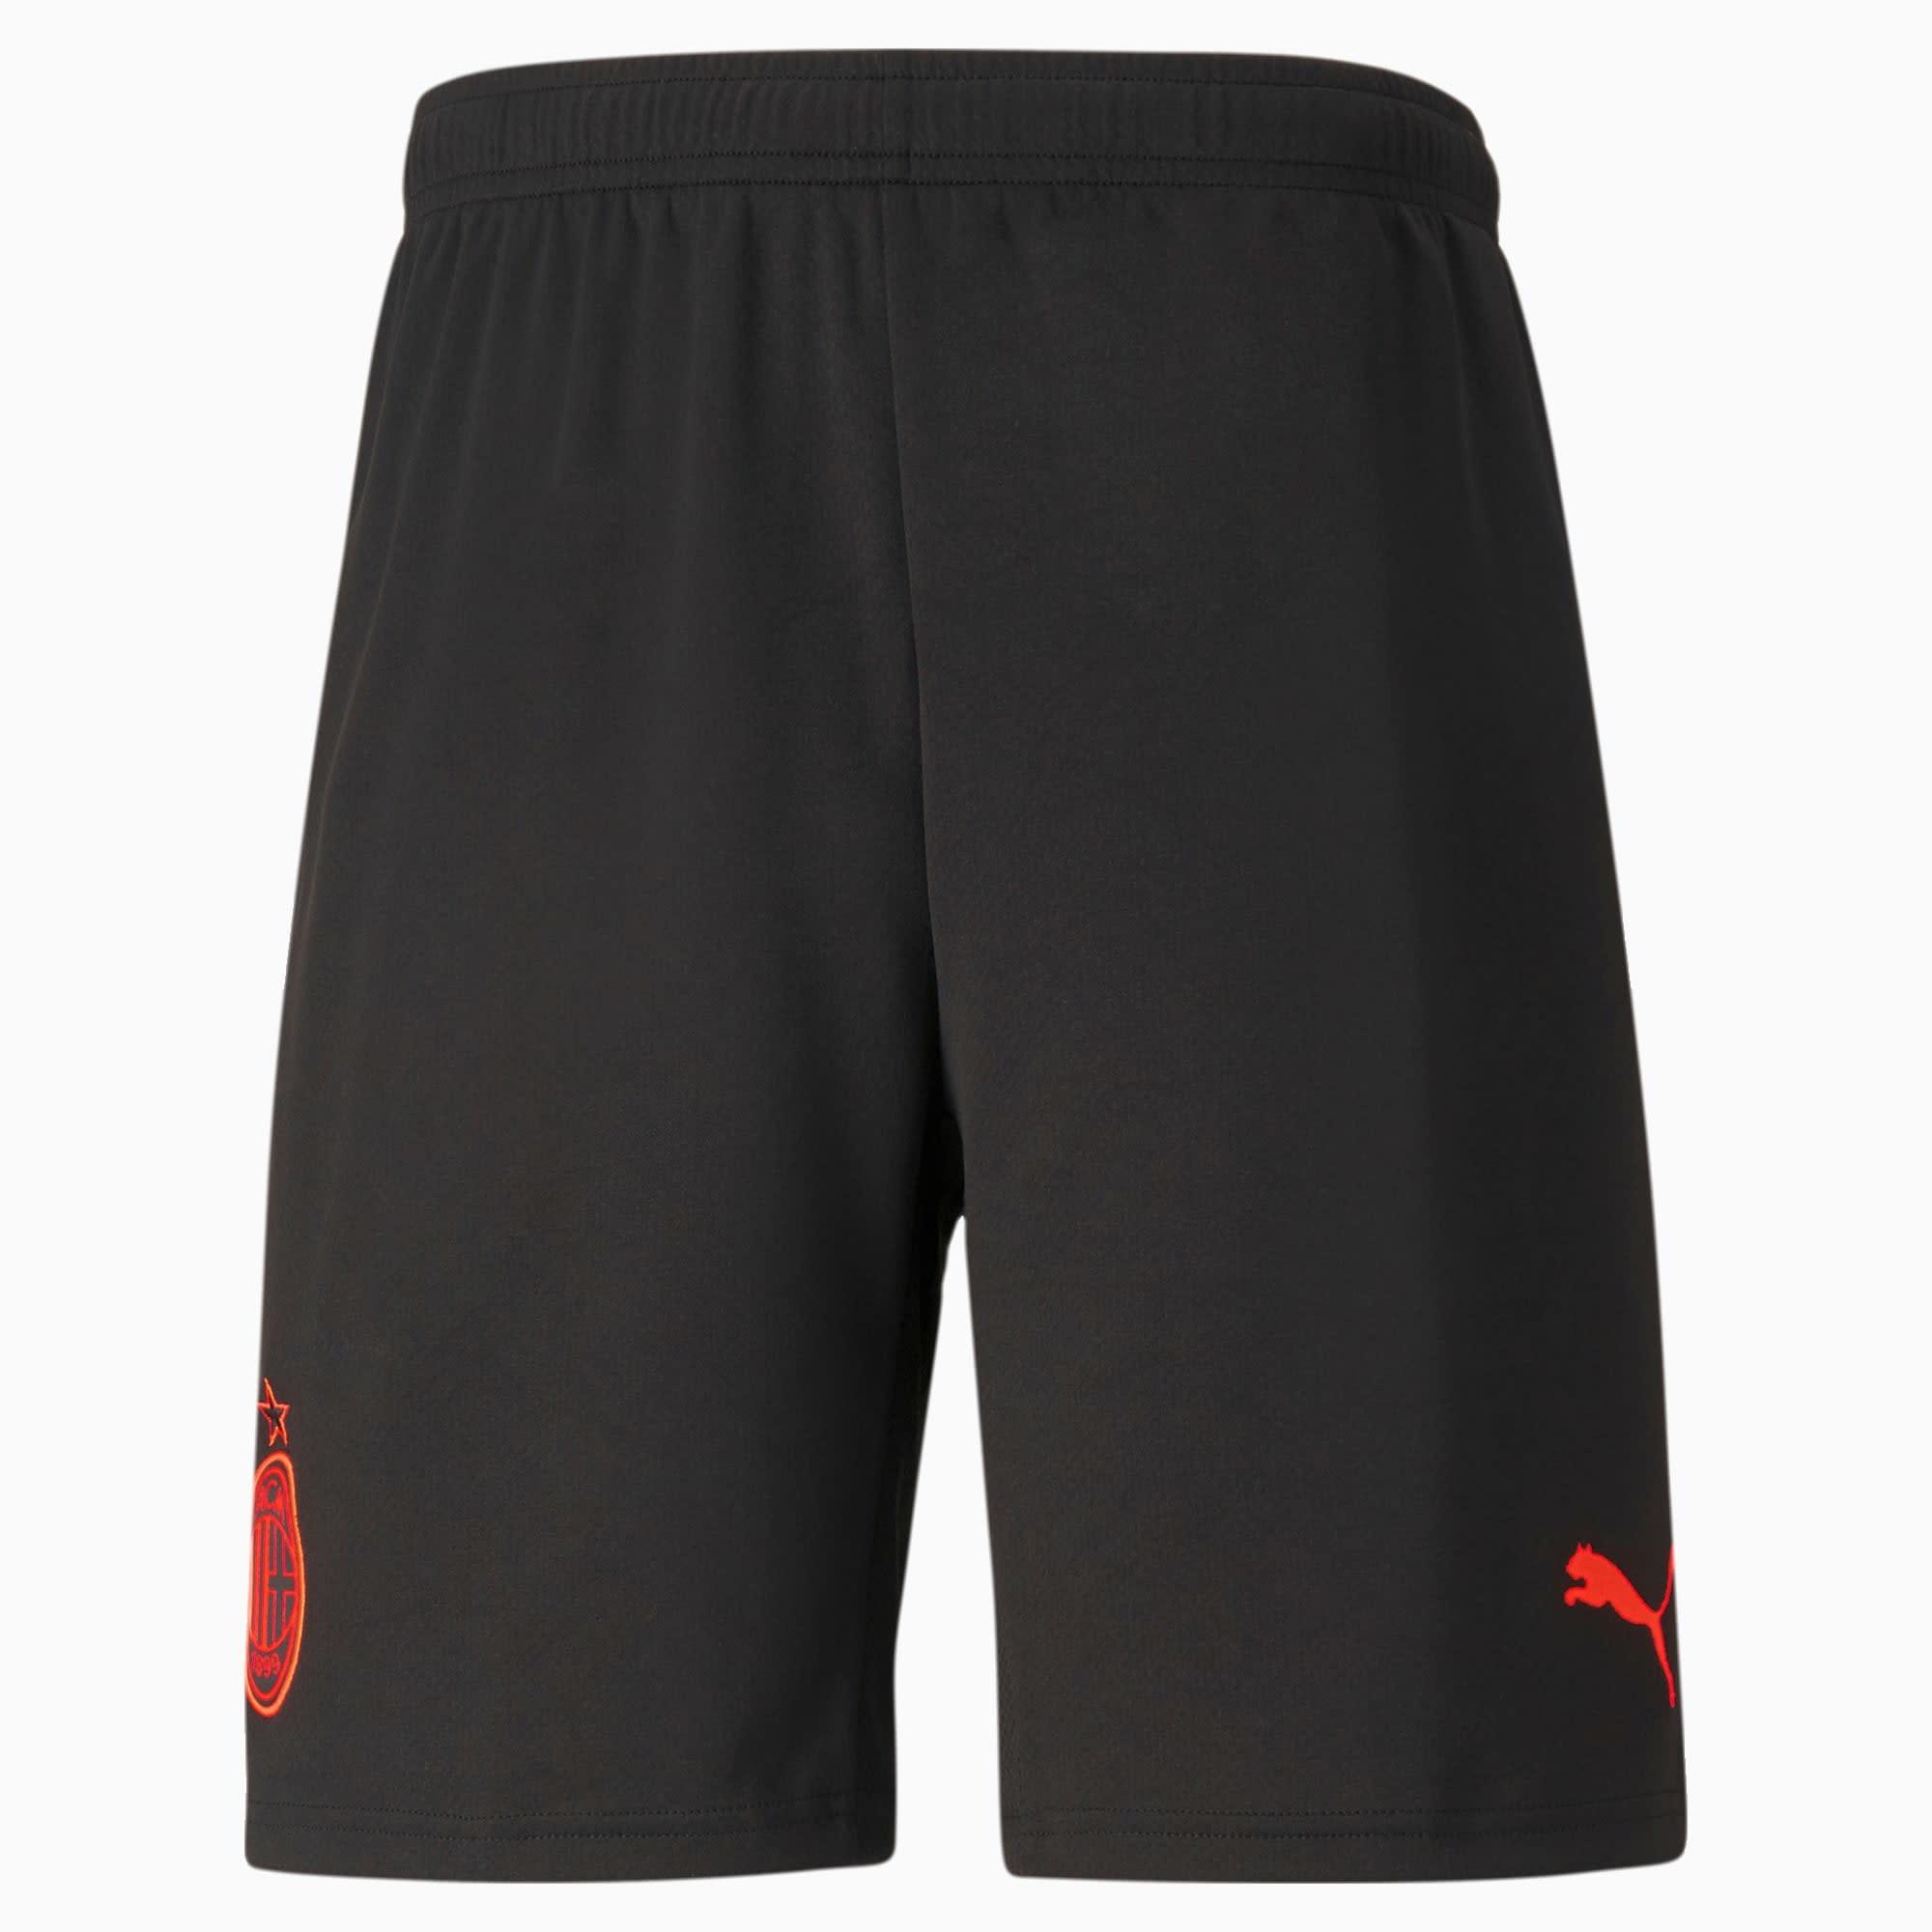 Puma AC Milan 3rd Short